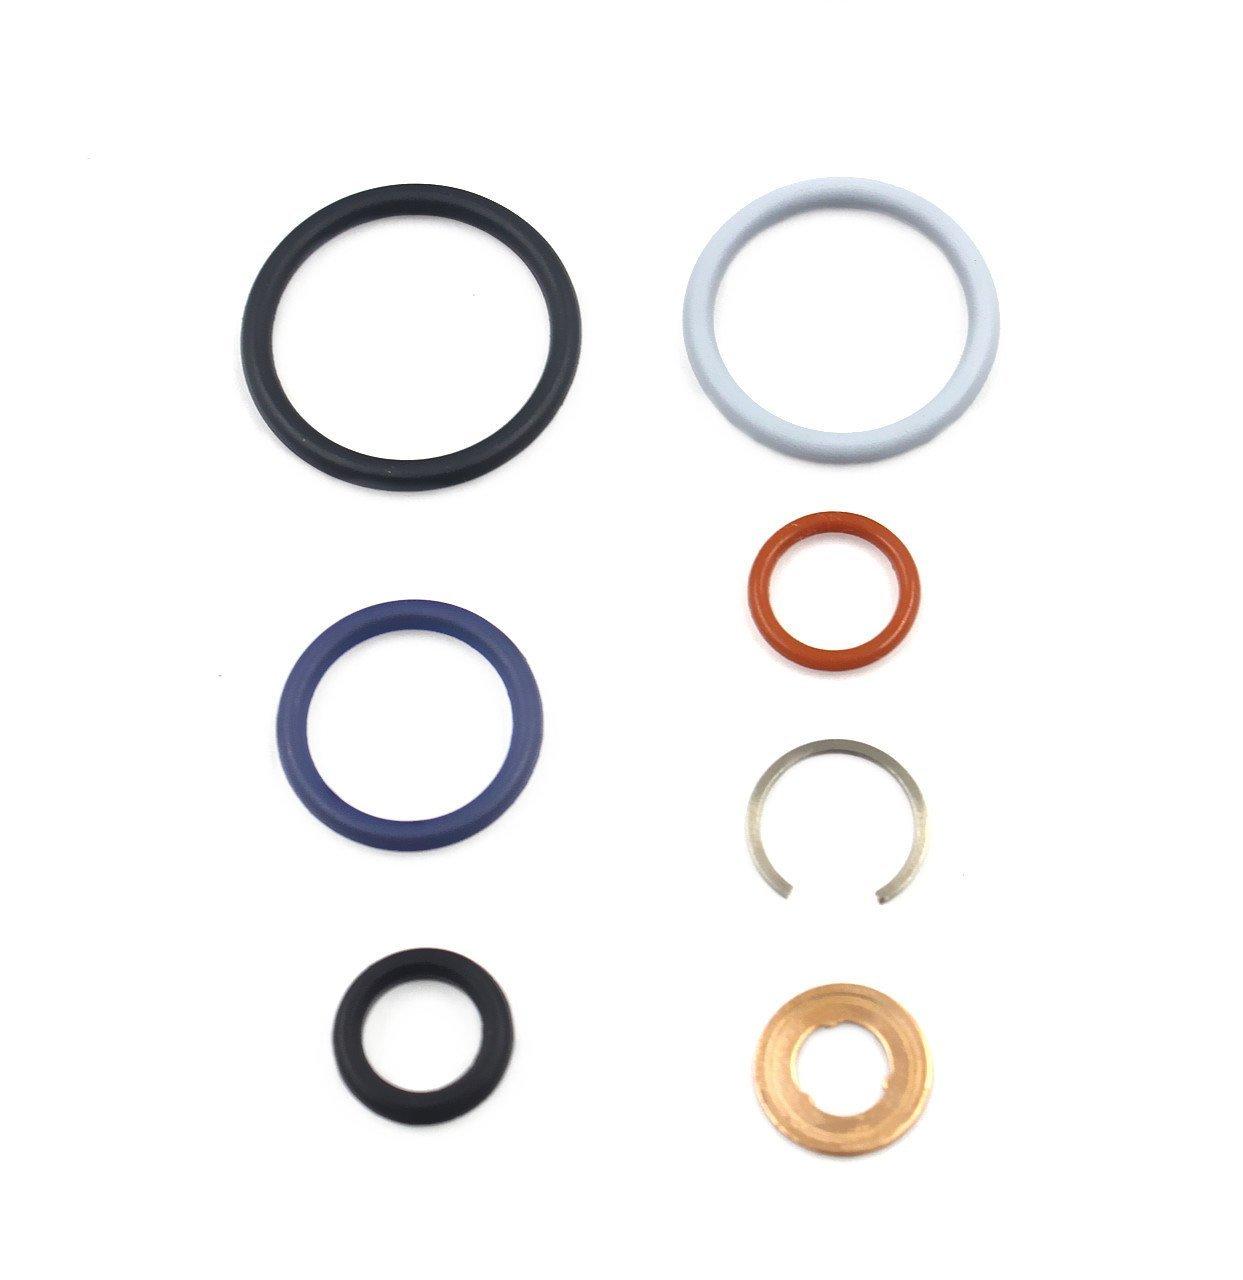 DEF AP0002 G2.8 Injector Seal Kit for Ford Powerstroke 4.5L LCF 2006-2010 6.0L 2003-2010 6.0L Navistar 2002.5-2010 3C3Z9229AA CM5055 1843682C91 Set of 1